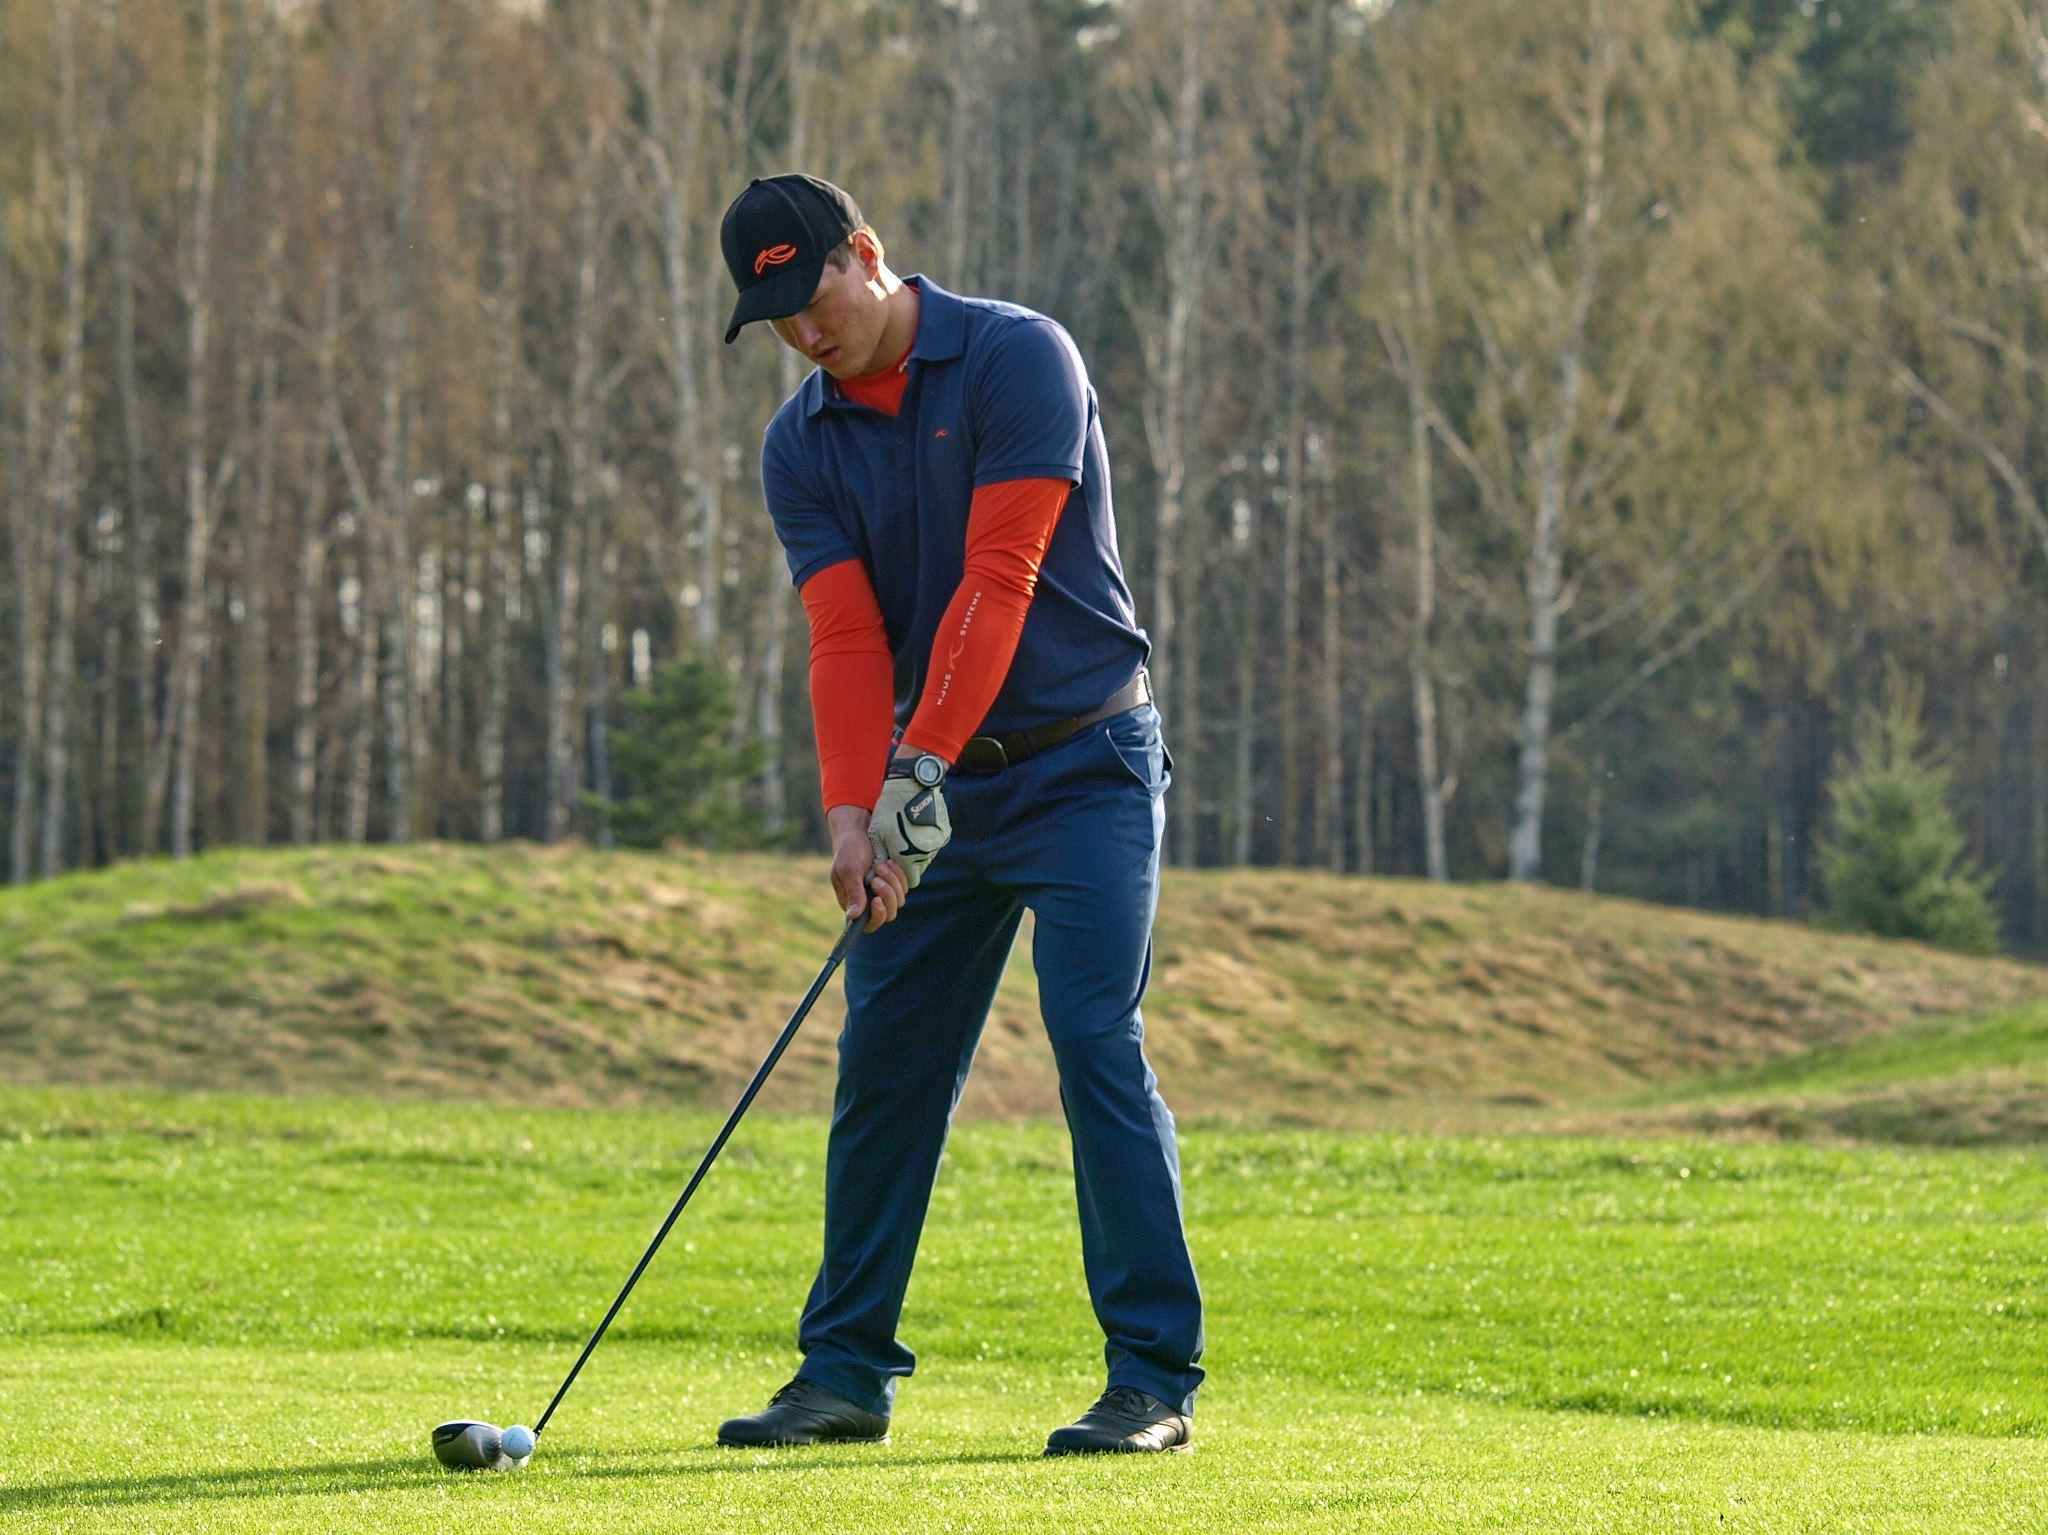 Kristaps_Golfs.jpg